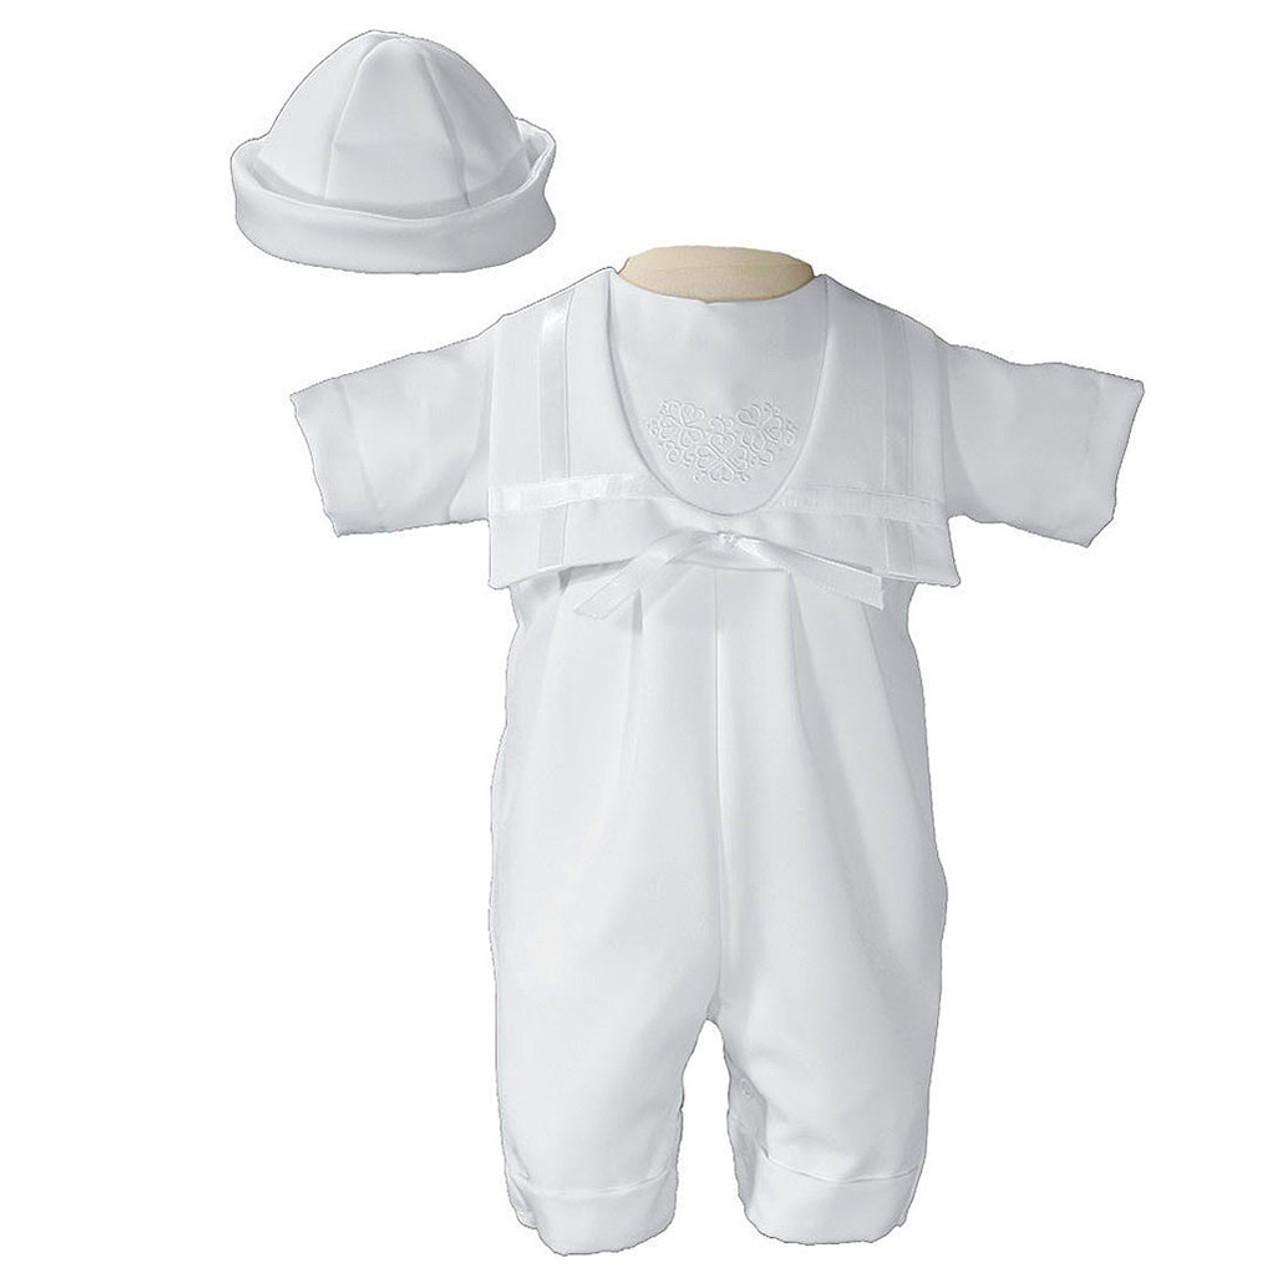 Boy's Gabardine Baptismal Suit with Shamrocks 12 Months